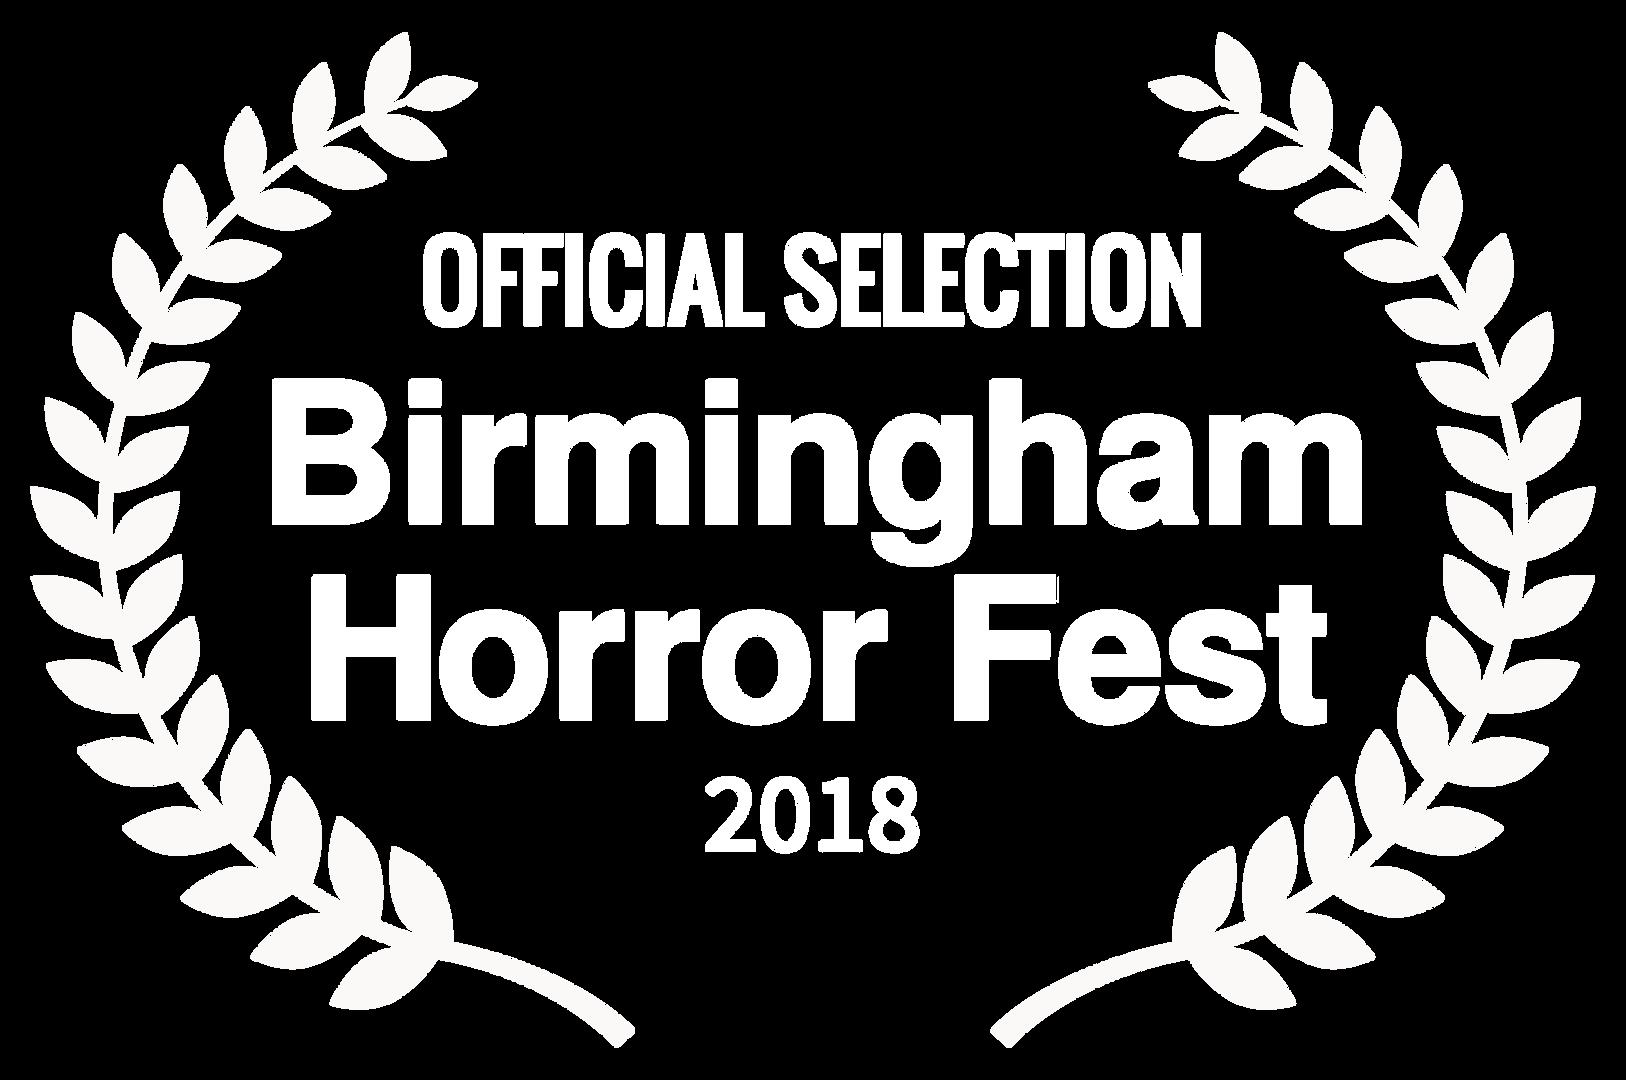 OFFICIALSELECTION-BirminghamHorrorFest-2